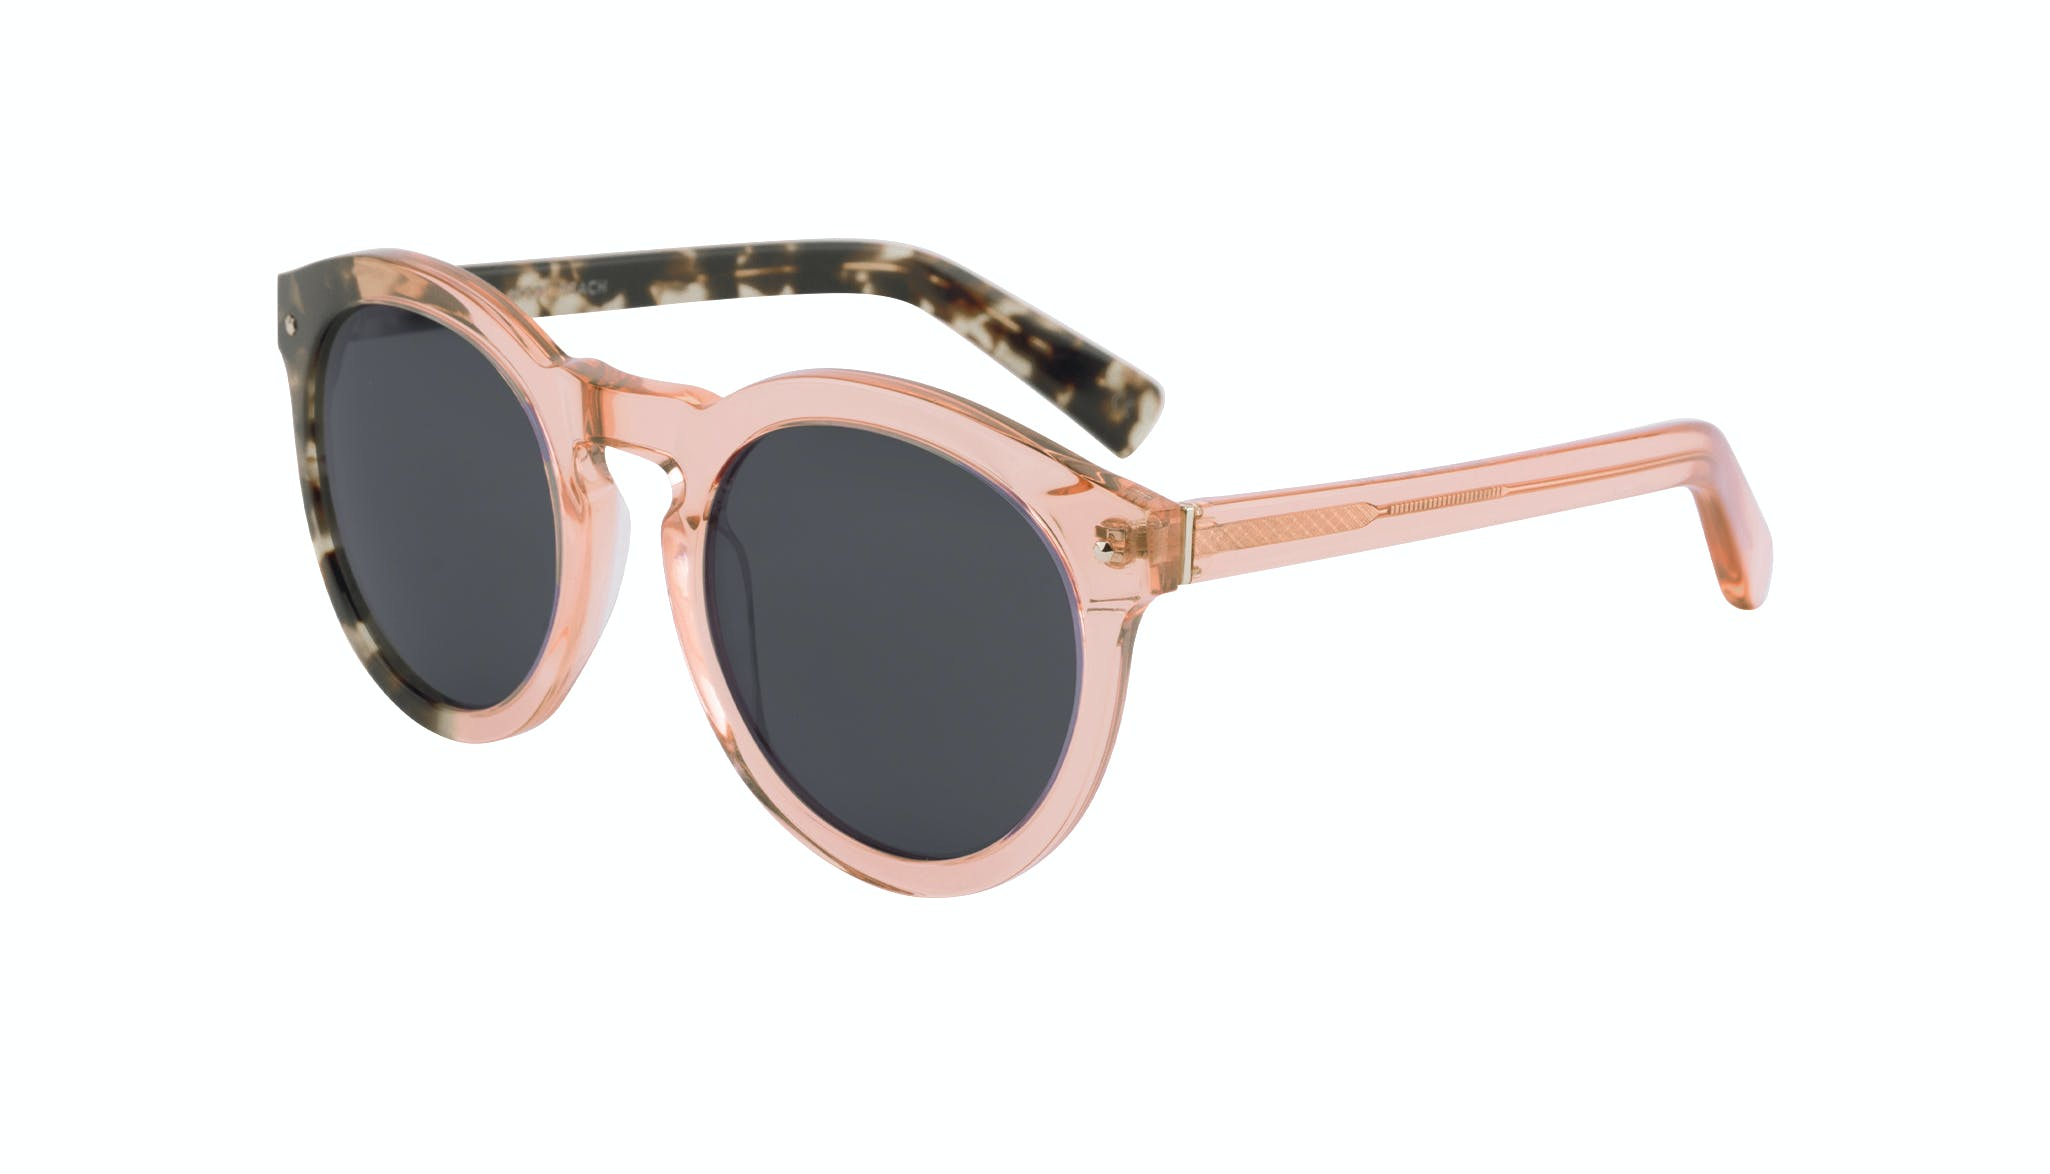 Affordable Fashion Glasses Round Sunglasses Women Mood Peach Tilt